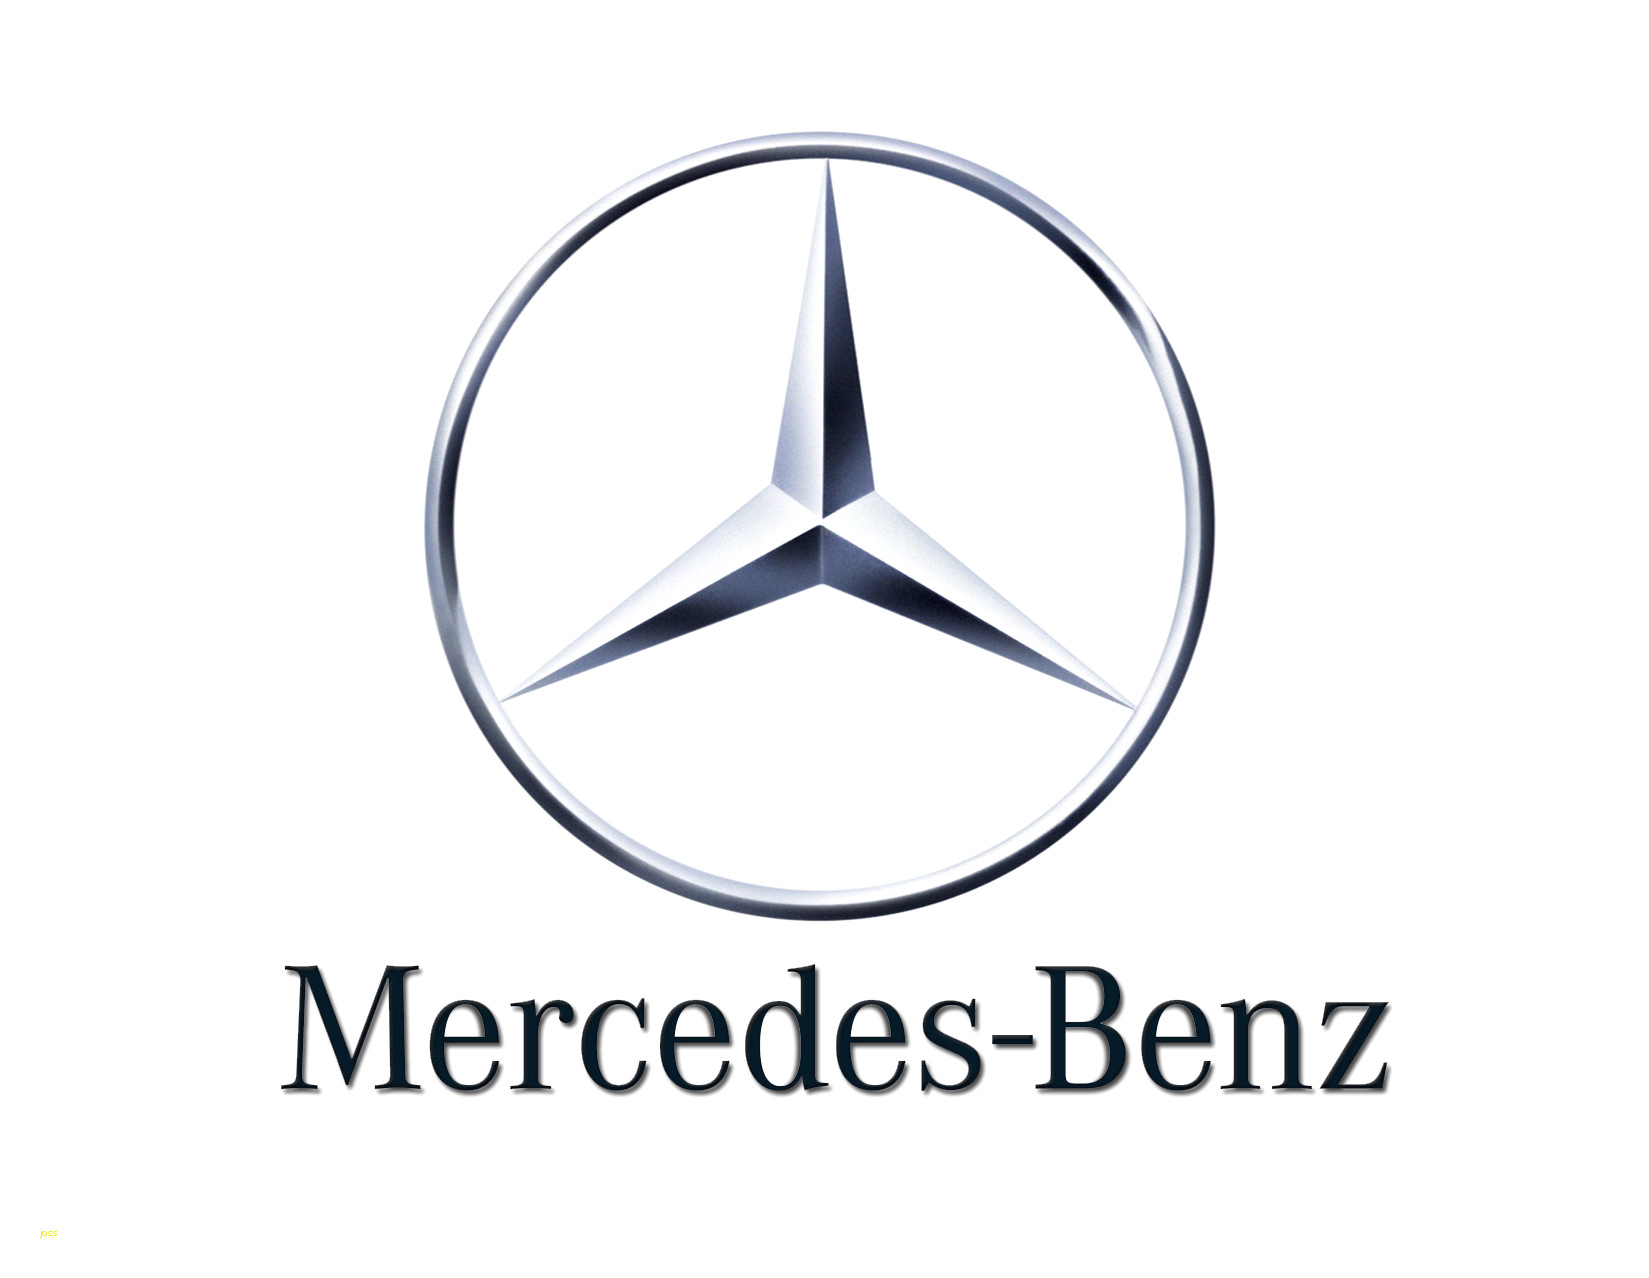 1649x1278 Mercedes Benz Logo Vector Inspirational Mercedes Logo